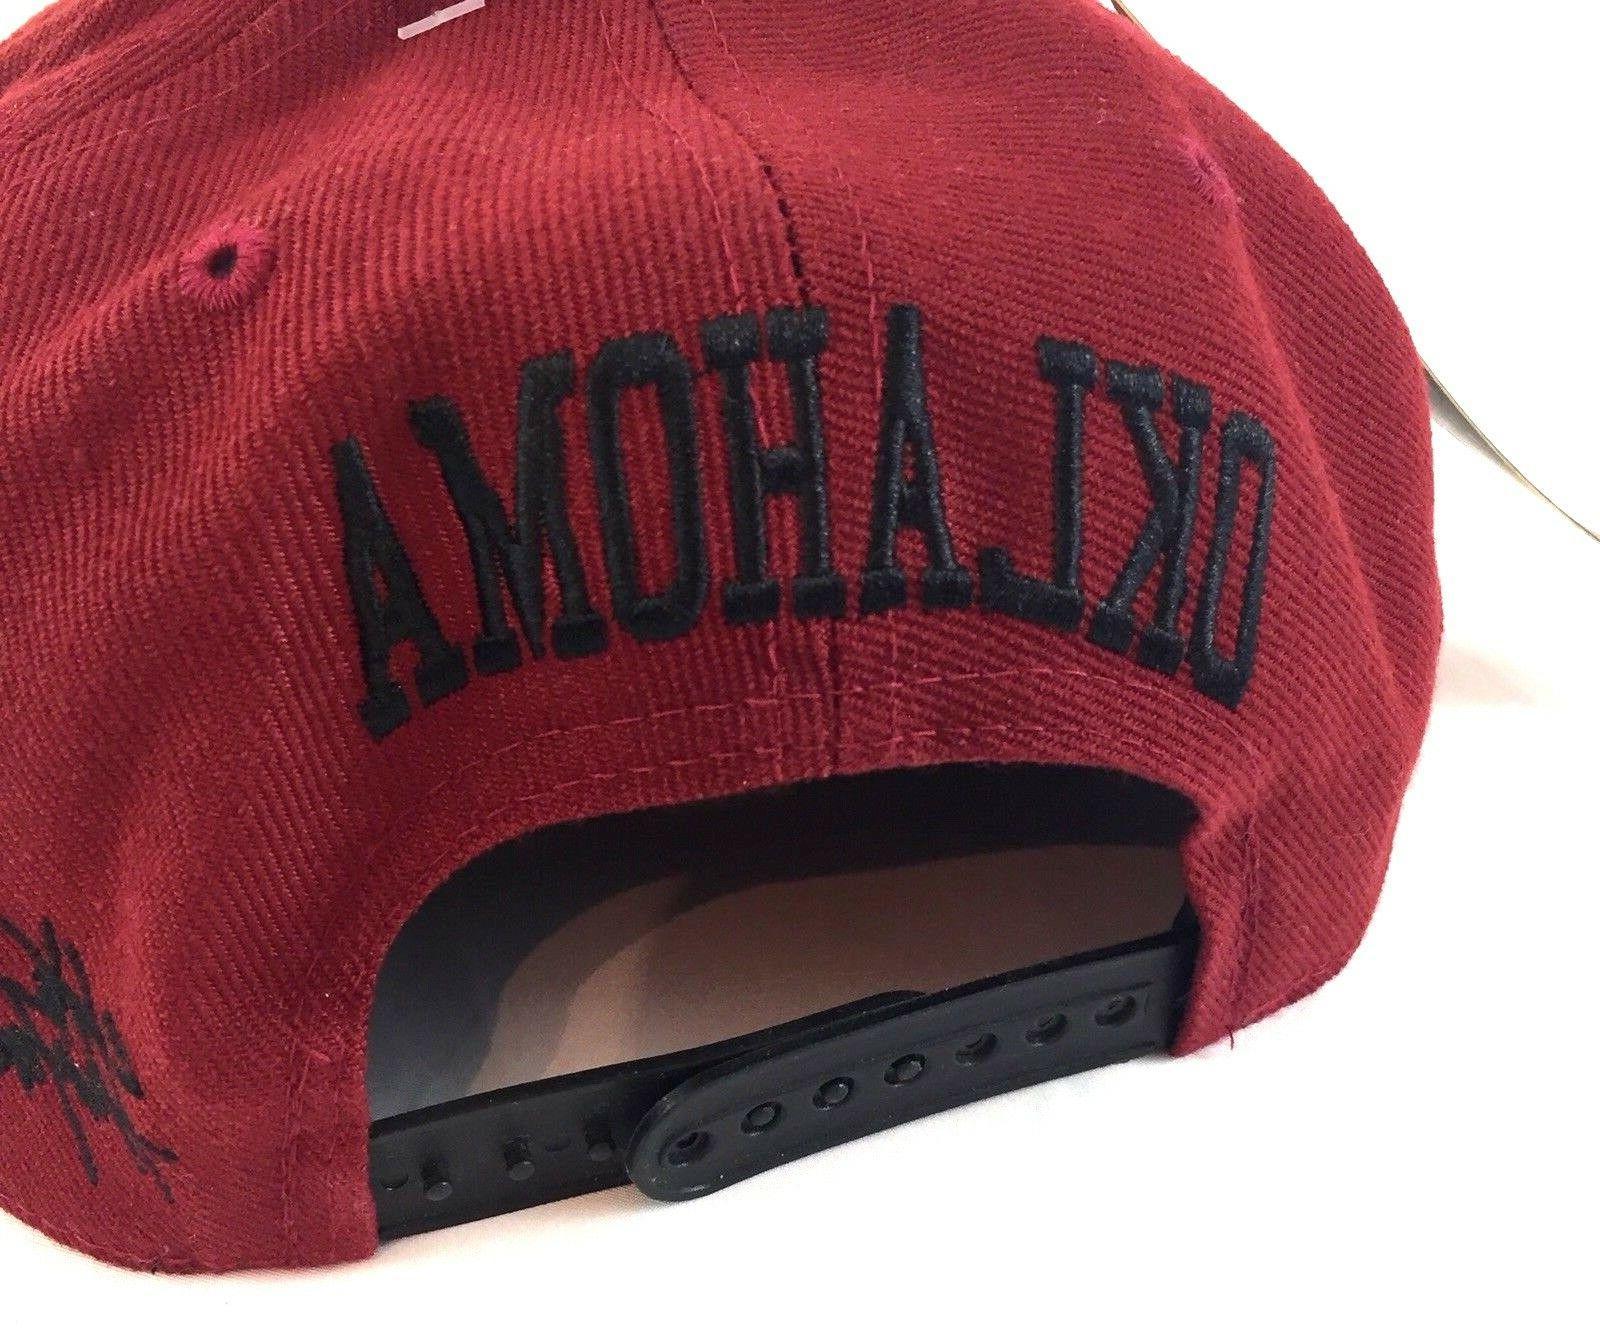 OKLAHOMA Hunter Headwear Flatbilled Sports Hat